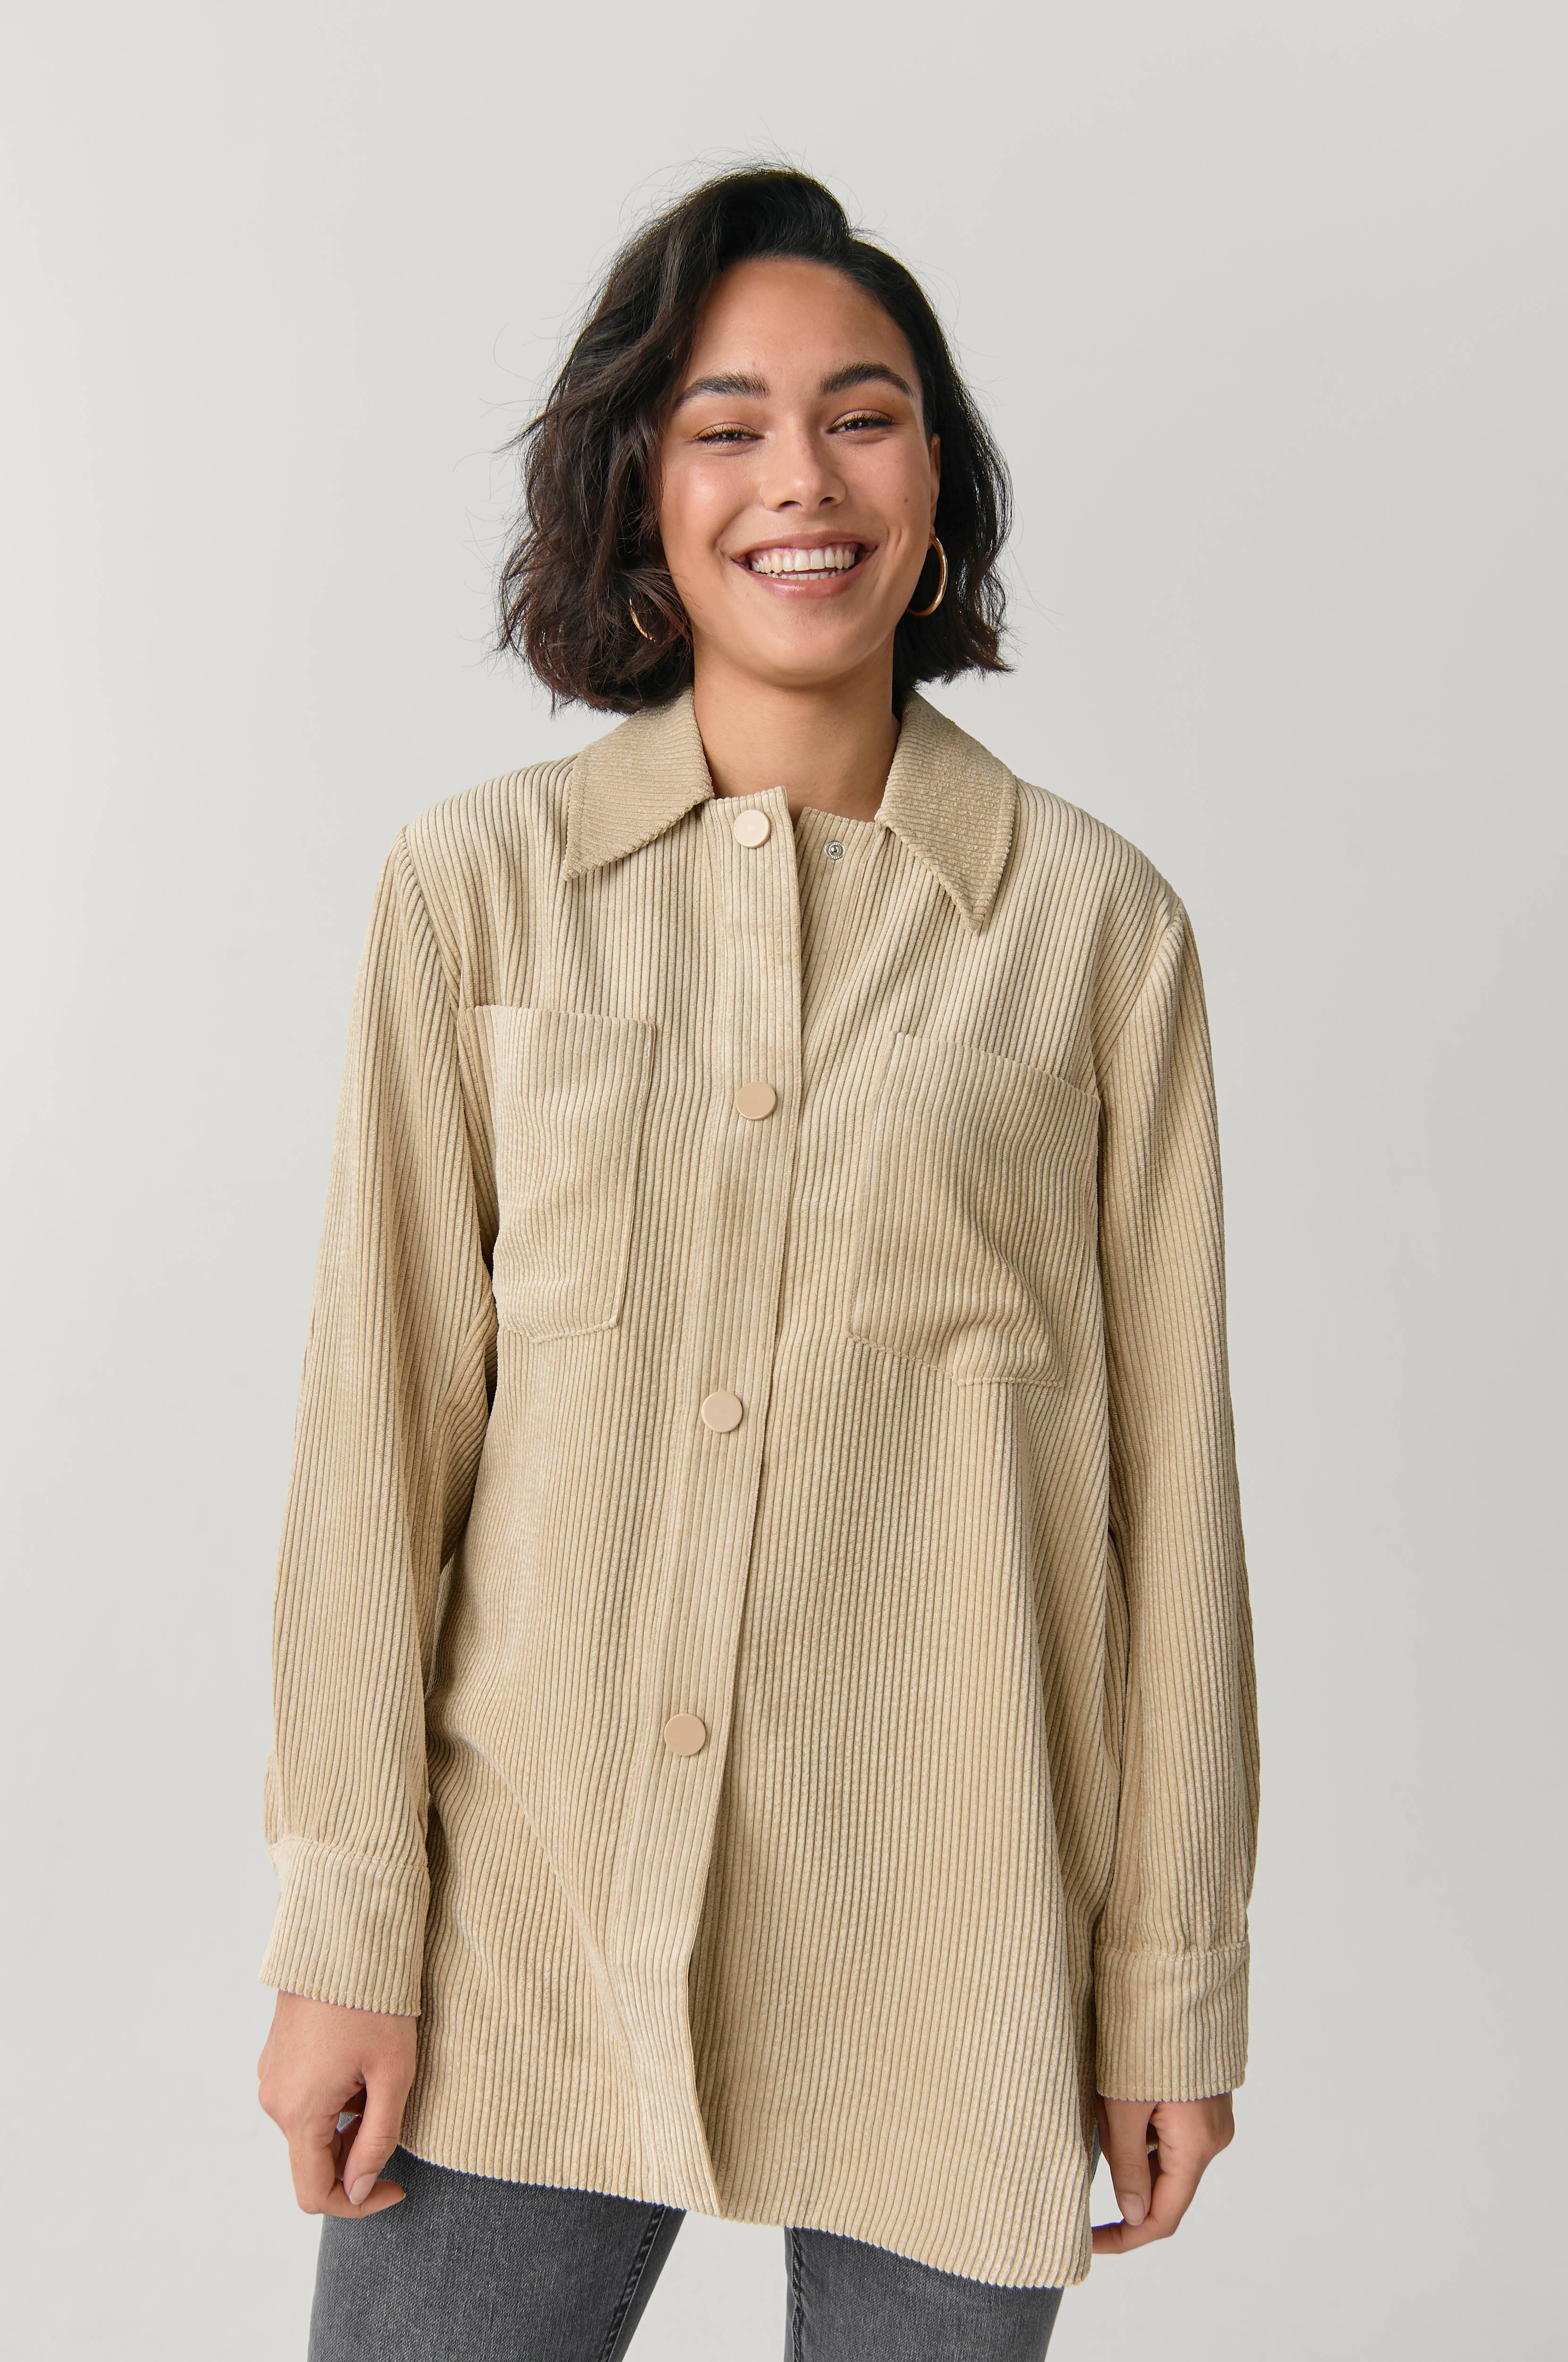 Jakke Gaia Jacket